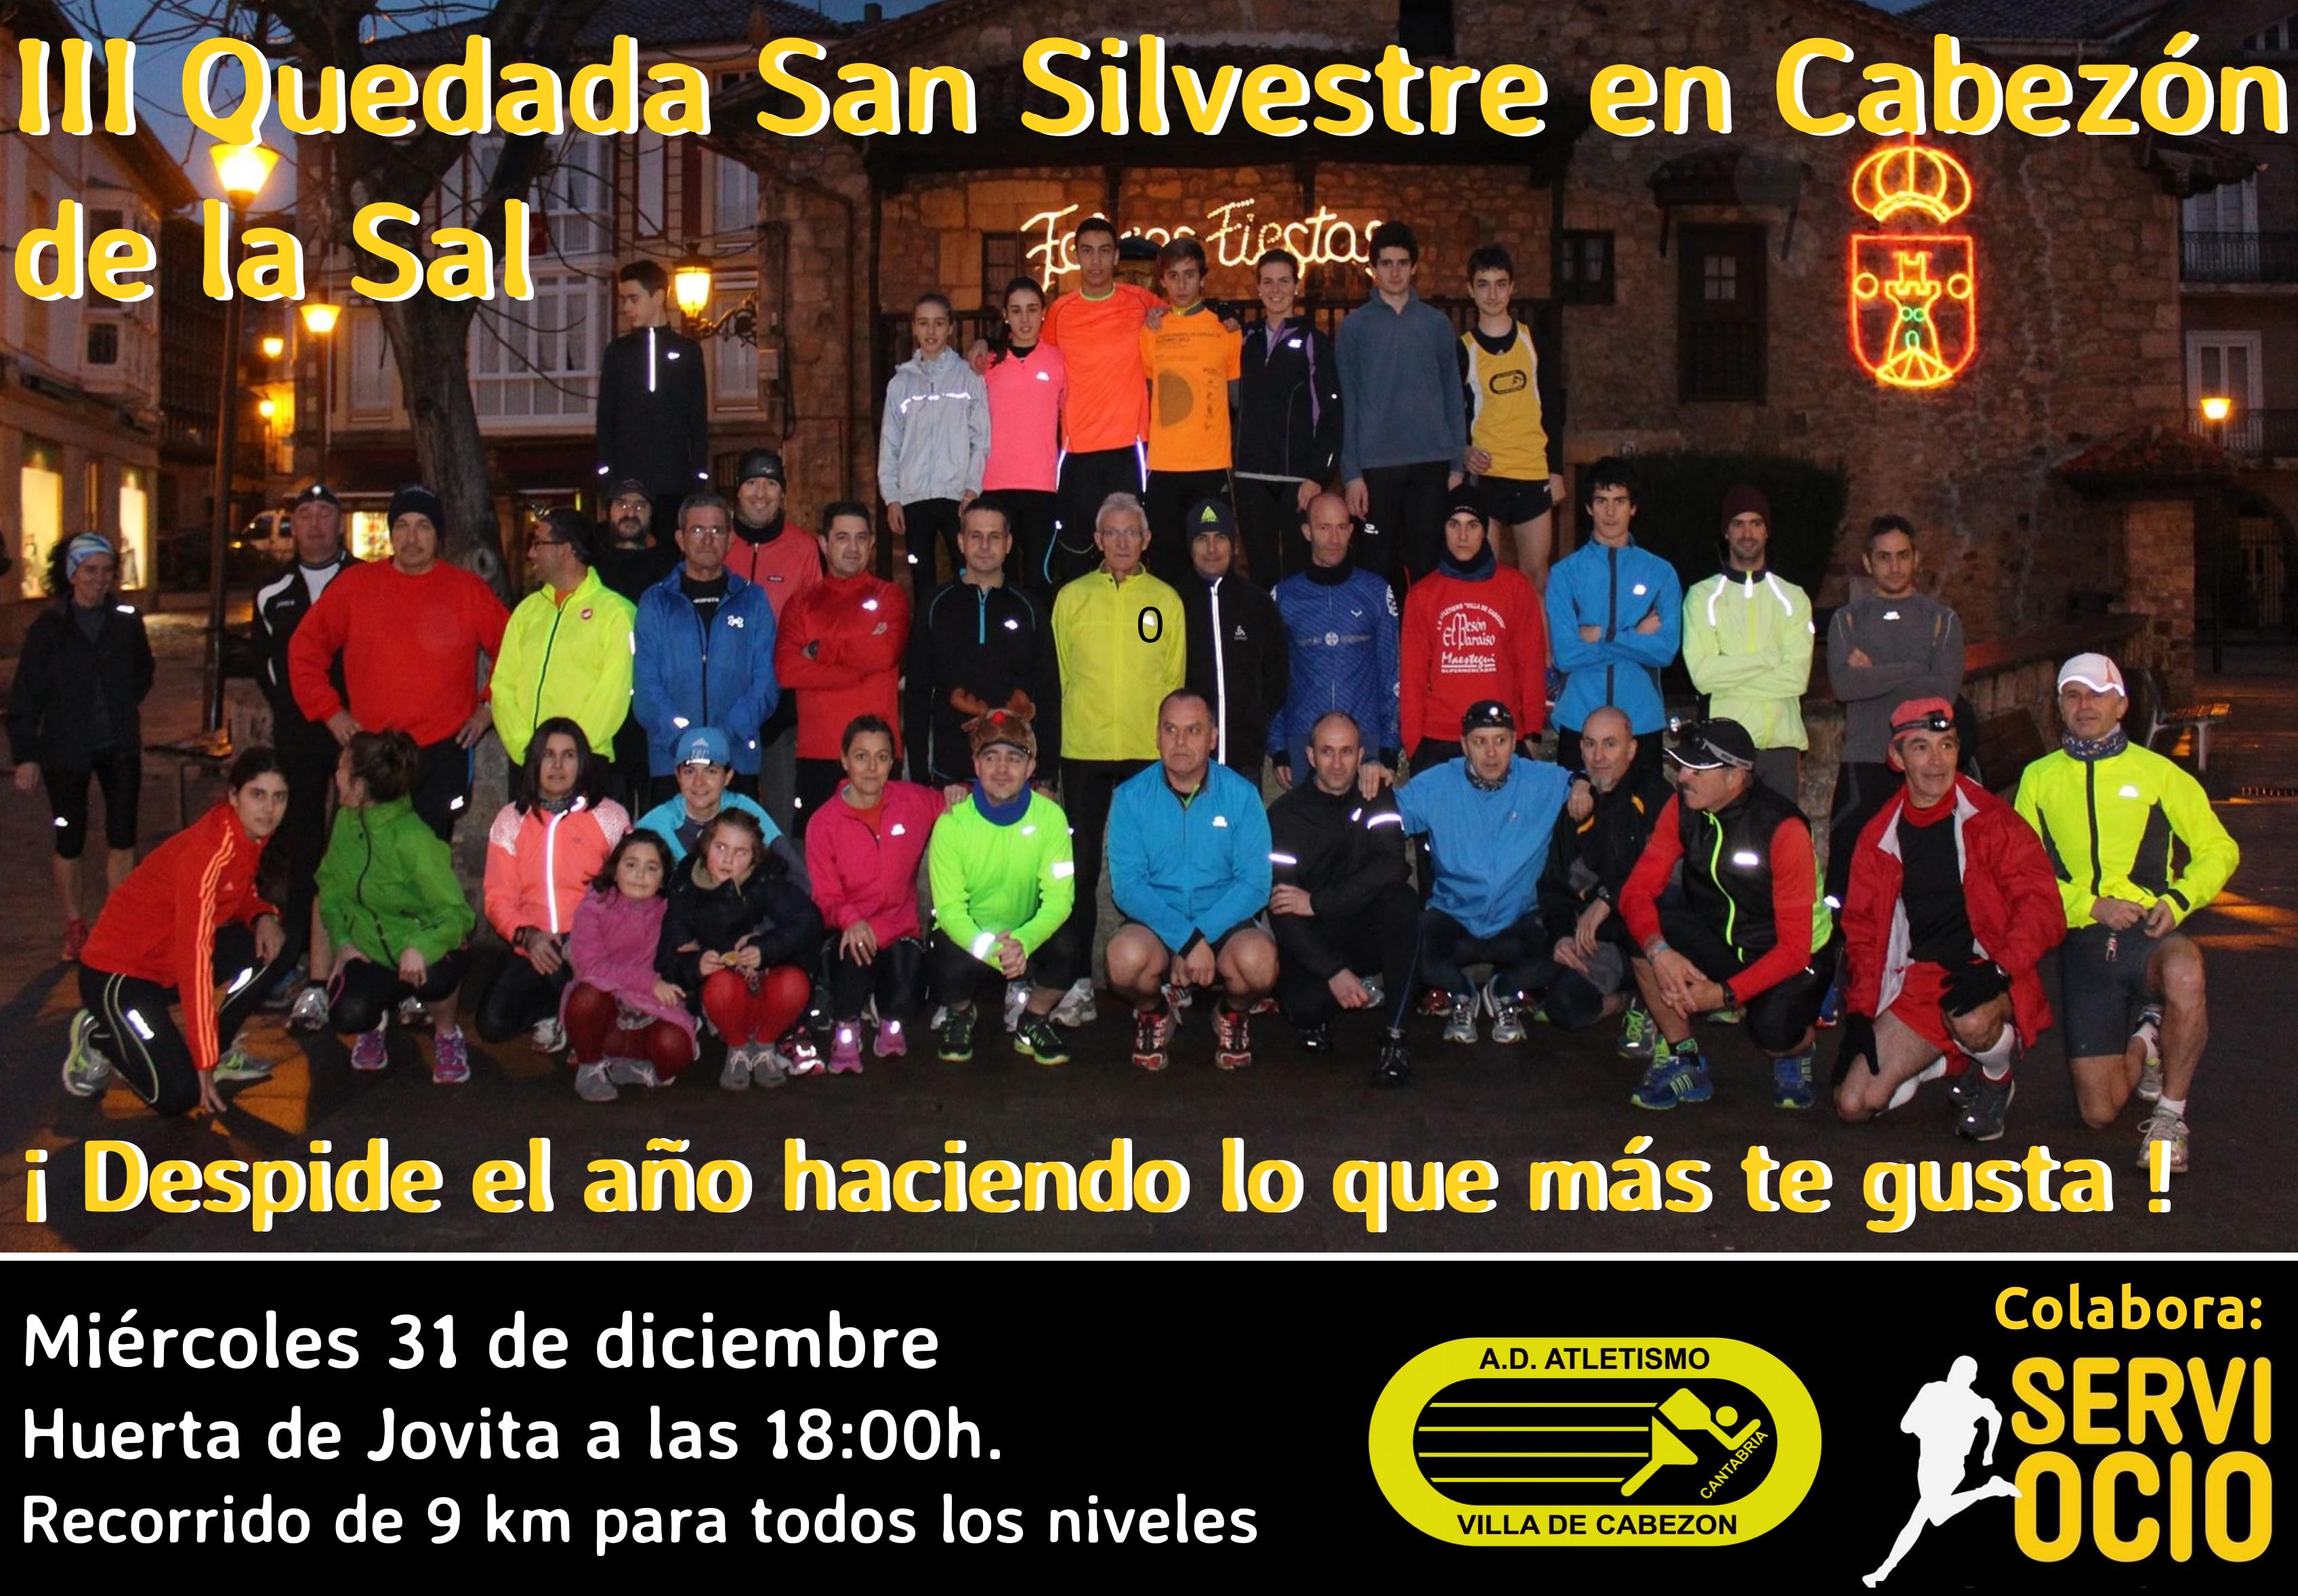 http://www.cabezondelasal.net/wp-content/uploads/2014/12/San-Silvestre-2014.jpg